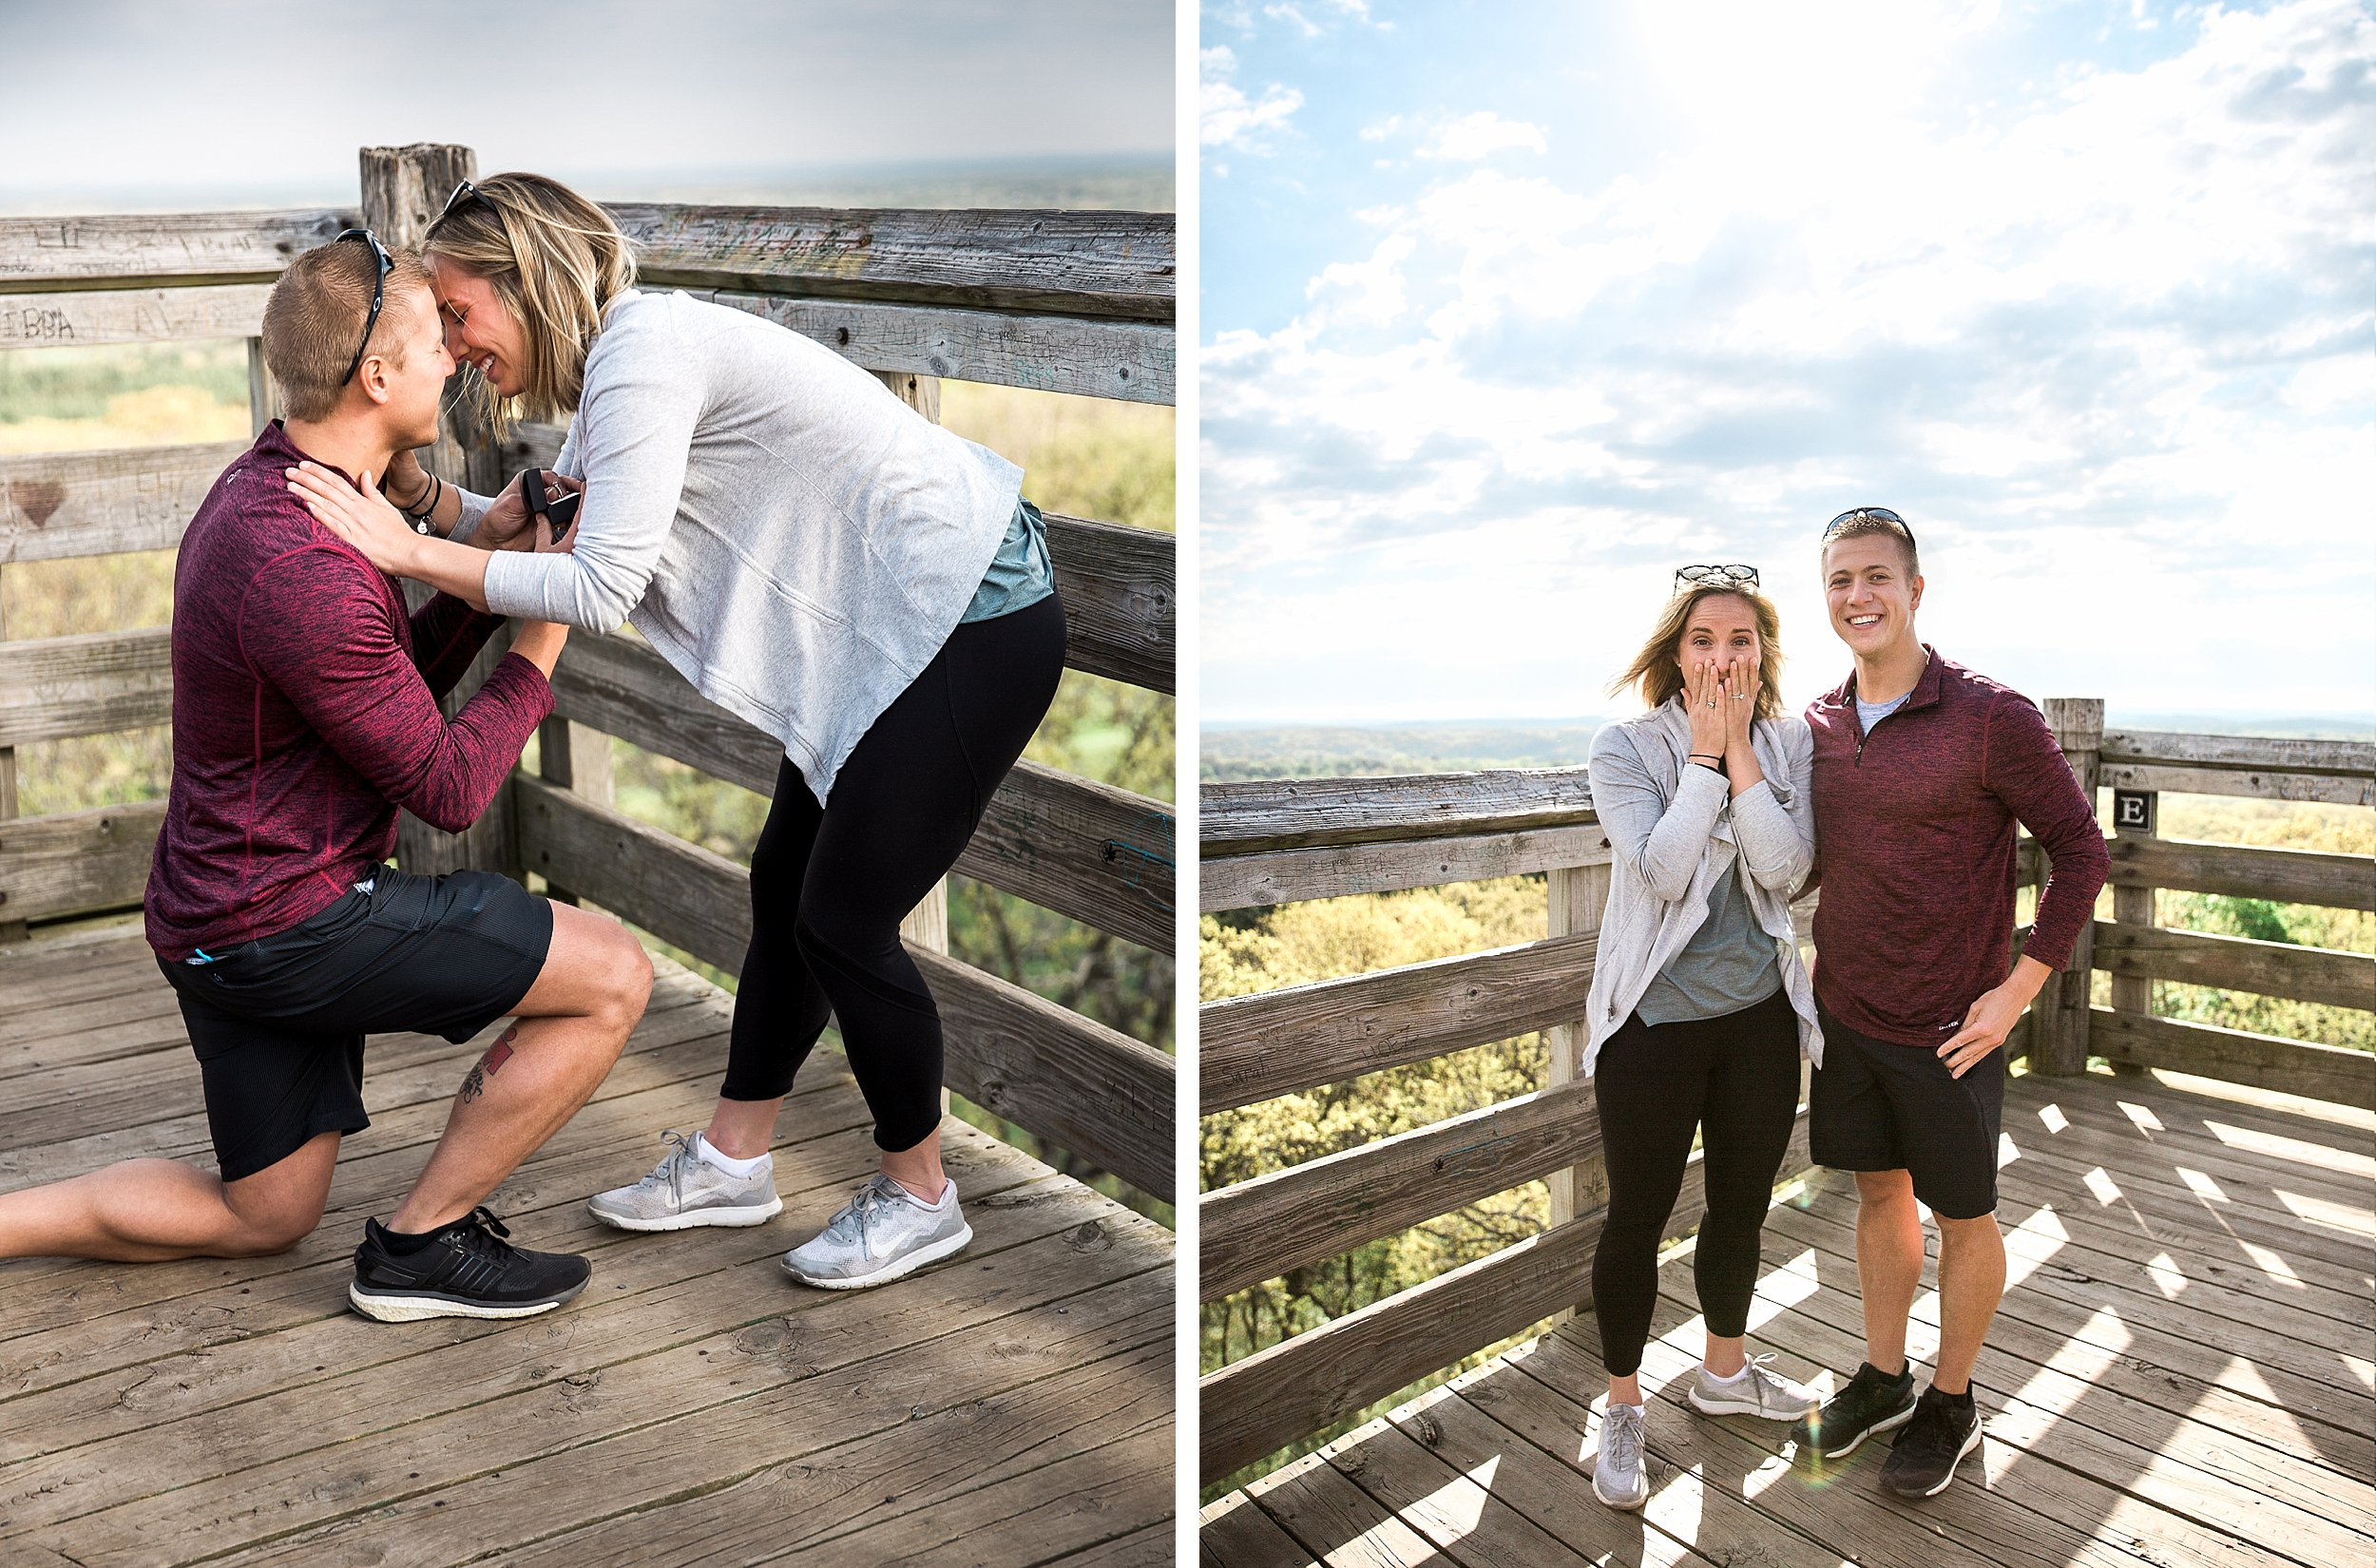 Courtney+Kyle_Proposal_HaleyKingCo_28_web.jpg